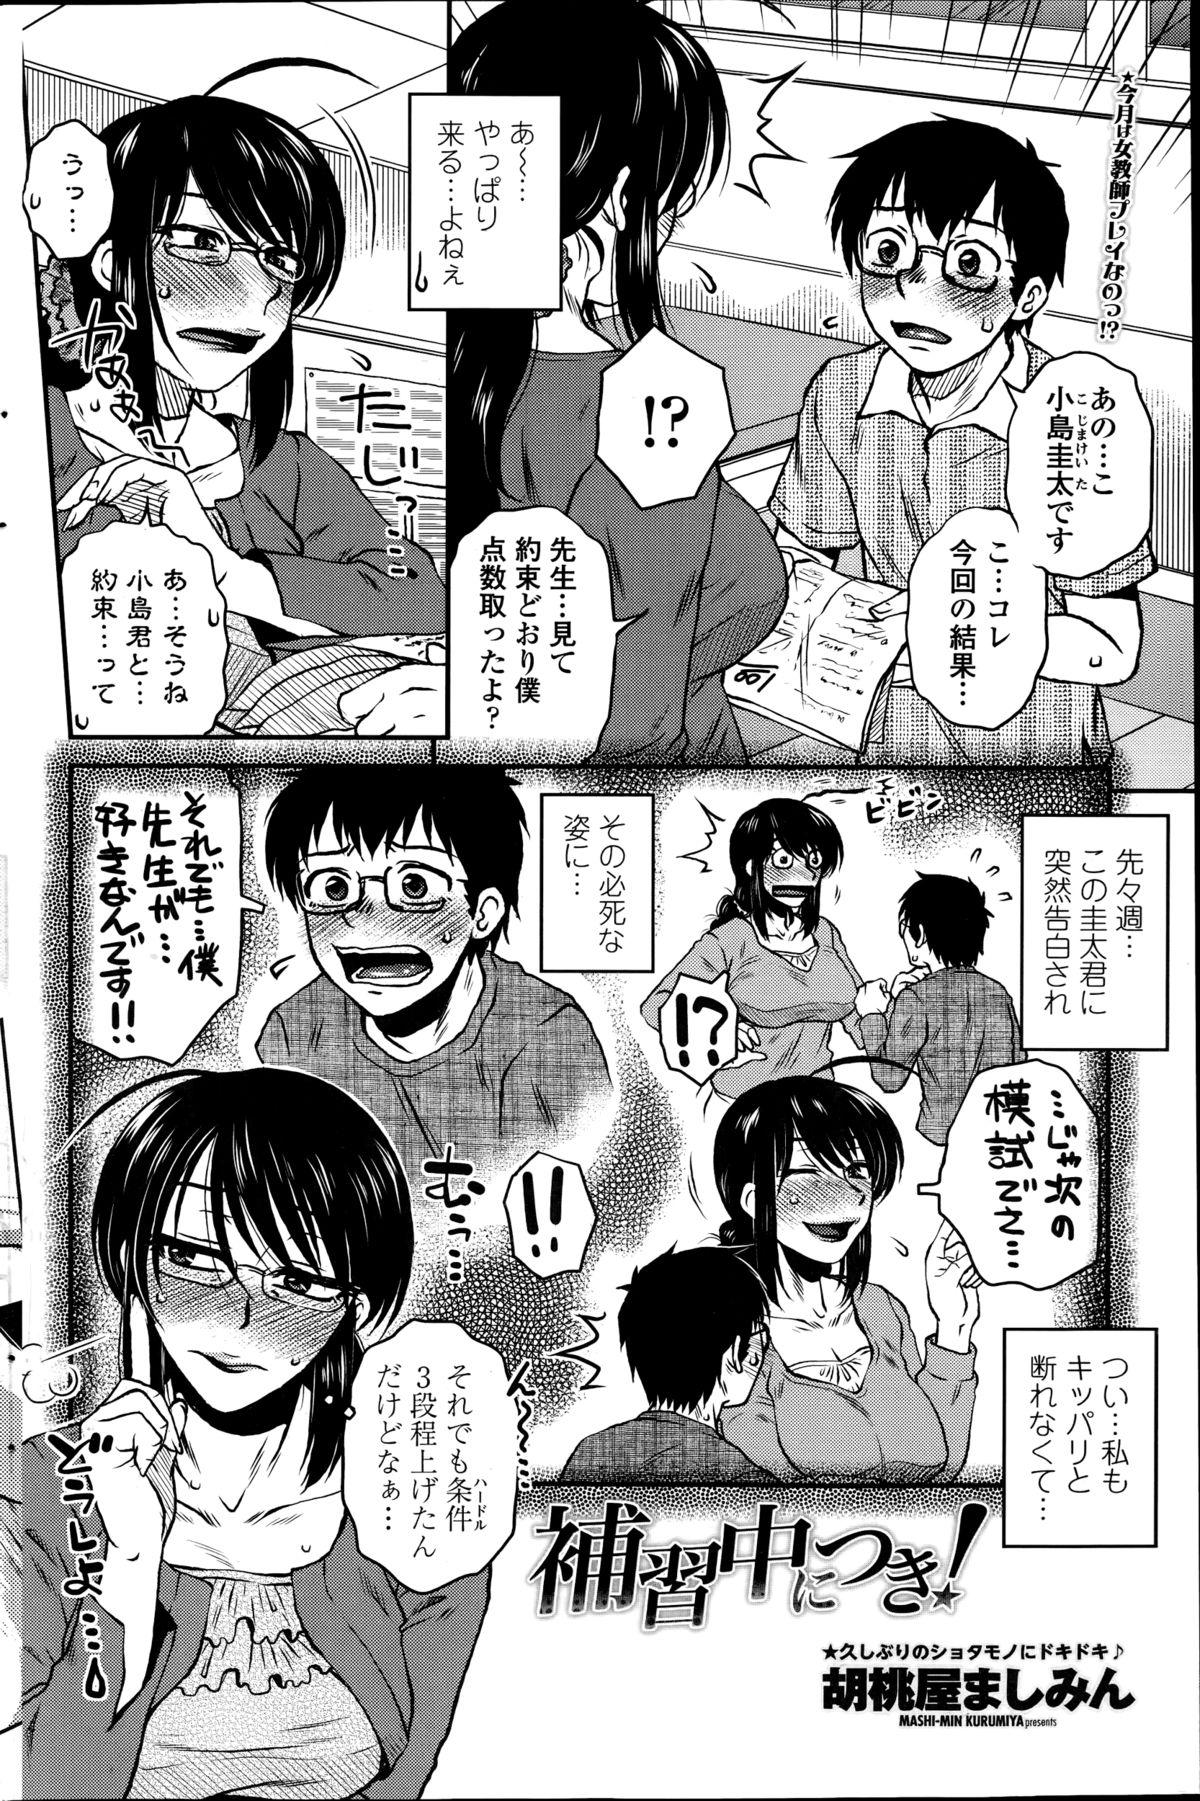 [Kurumiya Mashimin] Mikkai-chuu ni Tsuki Ch.1-6 41